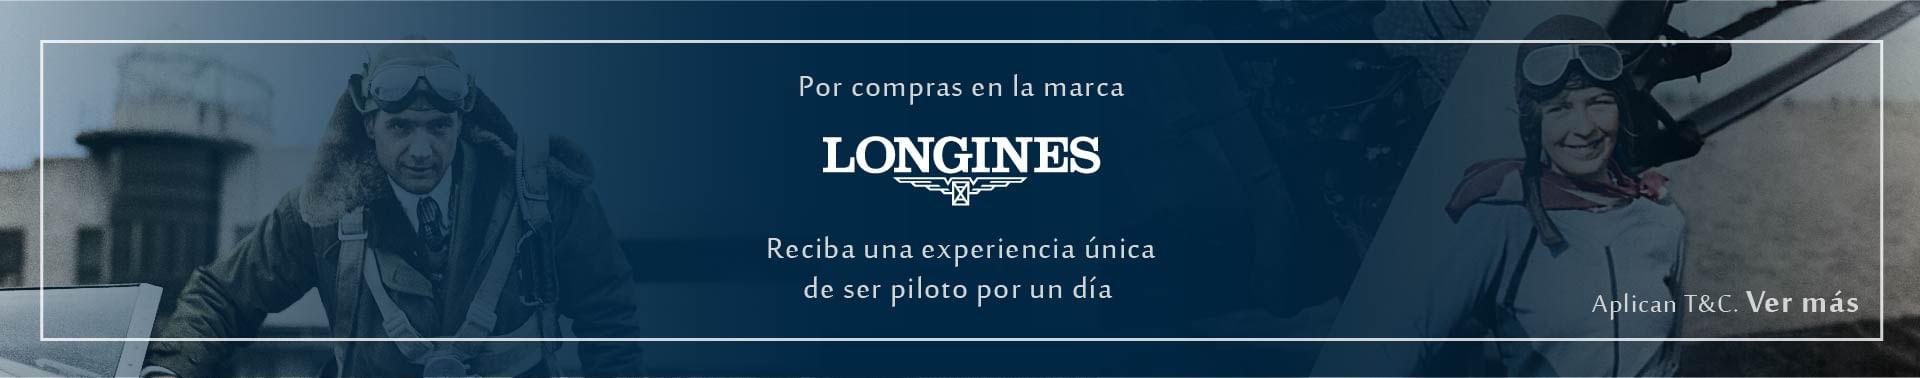 Experiencia Vuelo Longines